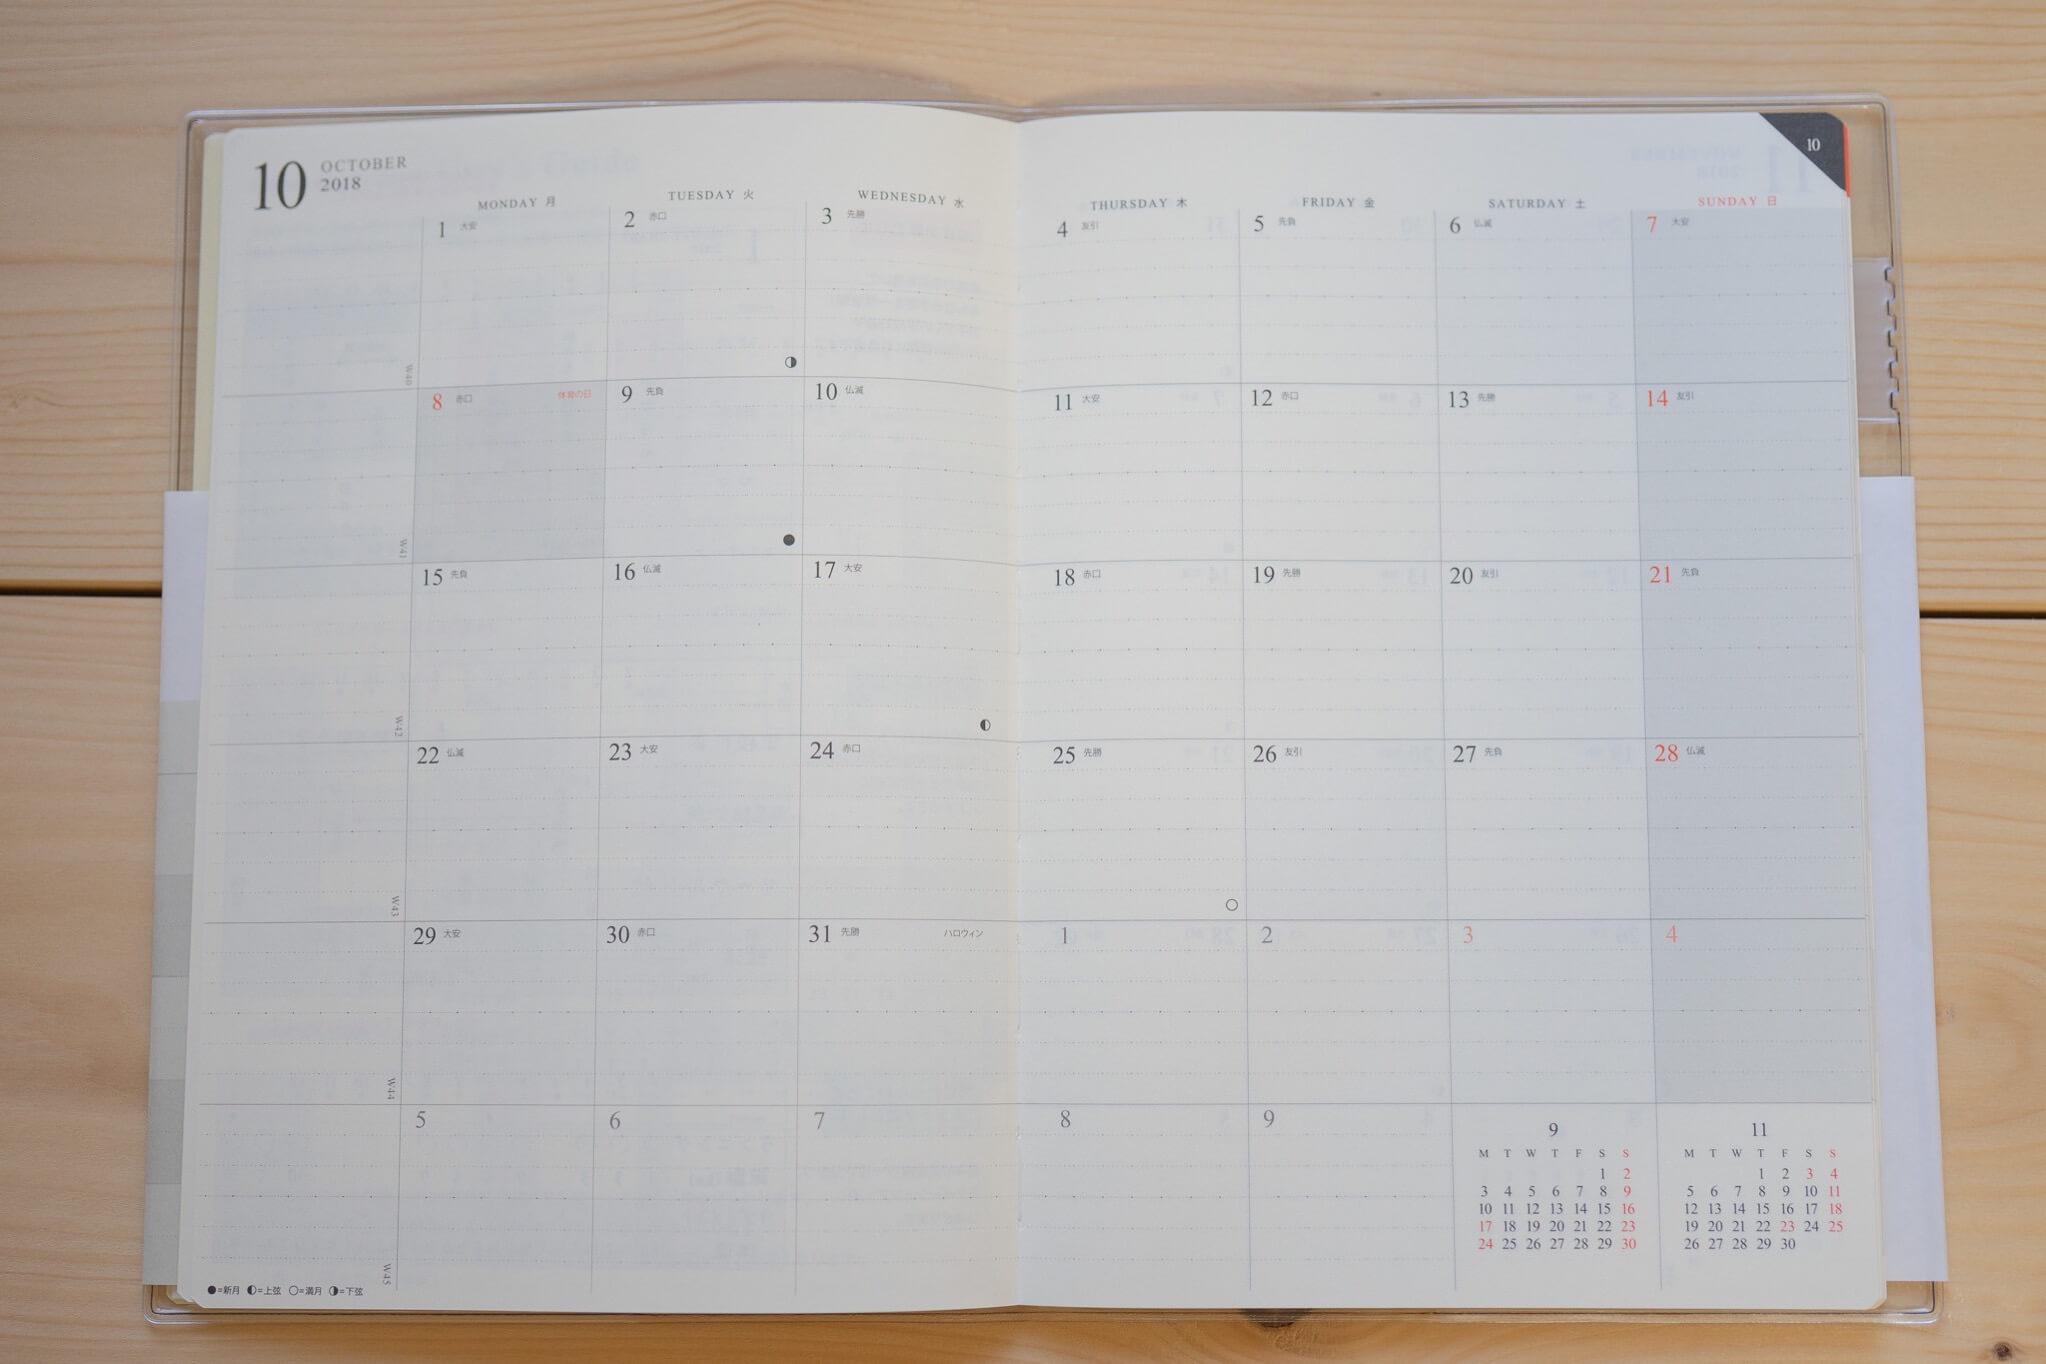 180828 gantt chart diary 7